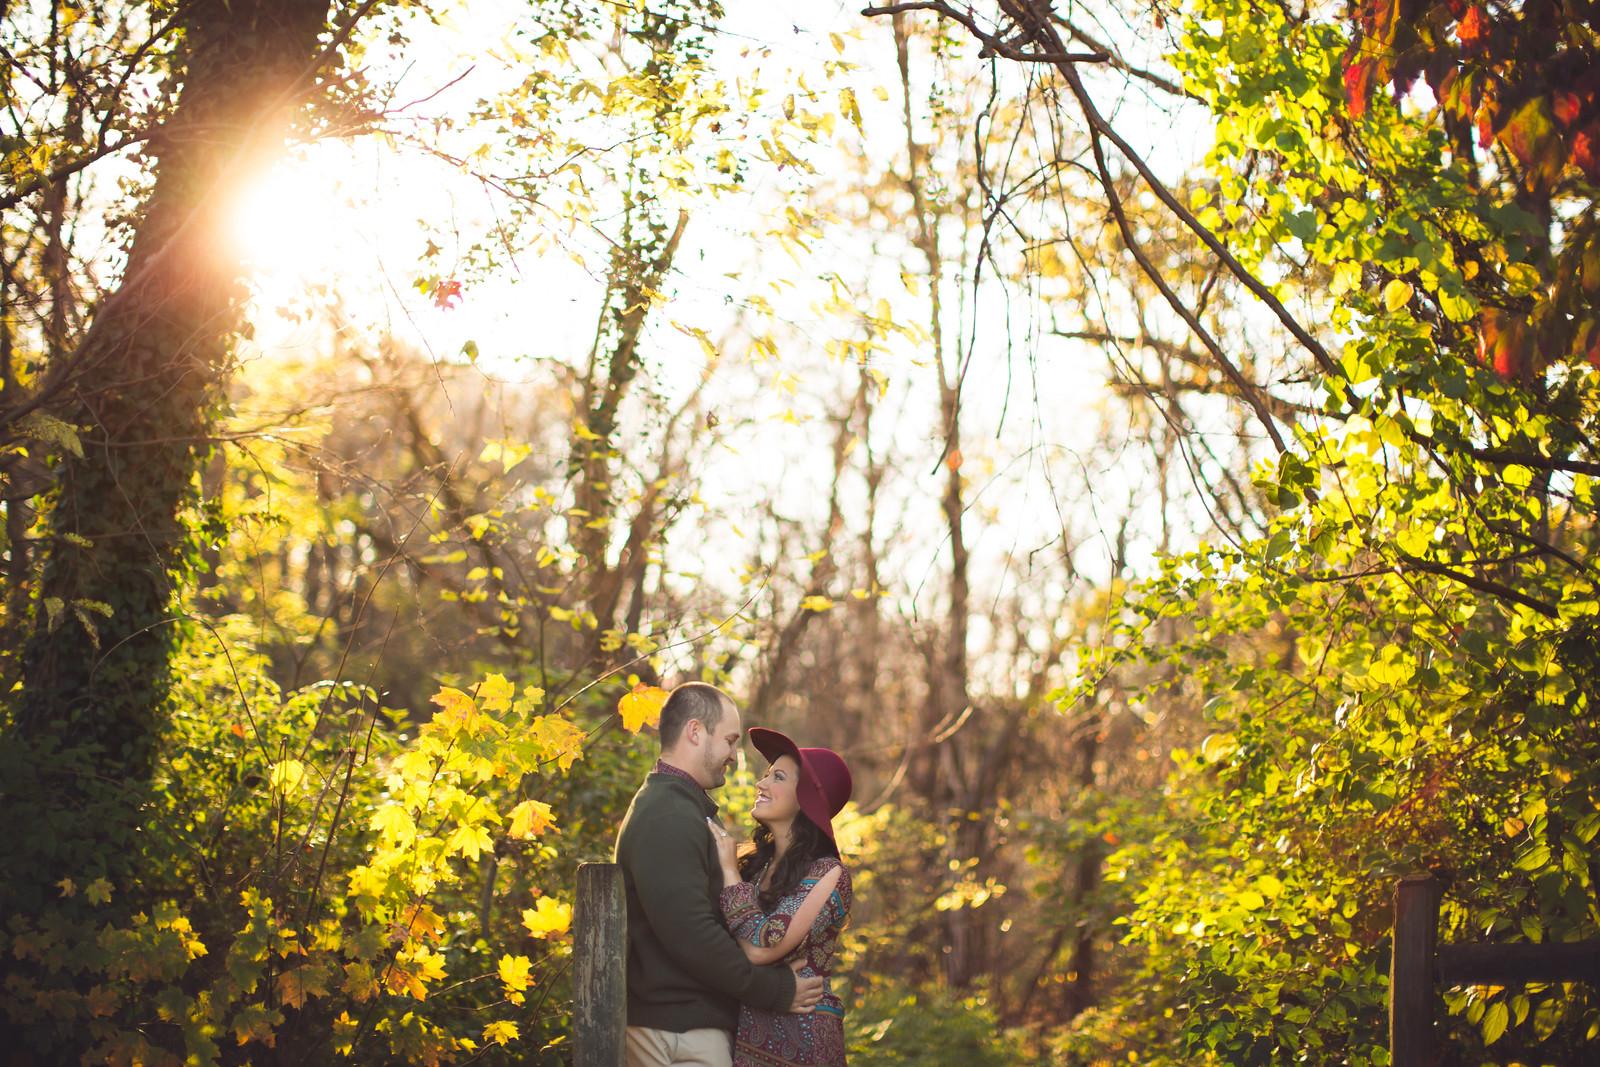 030_Josh+Lindsey_Engagement-X3.jpg